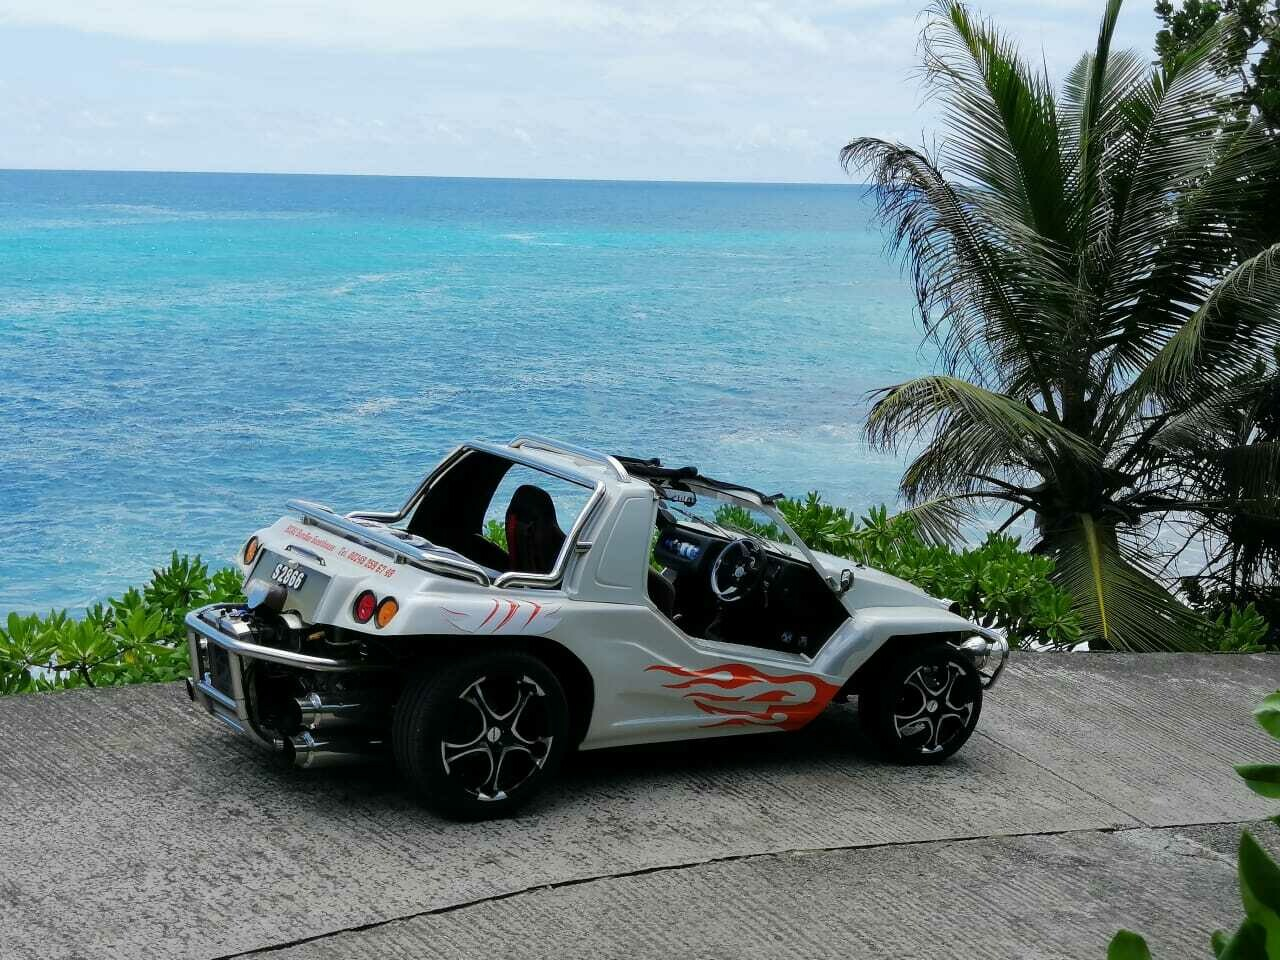 MAHE: Private Erlebnistour mit Guide - ganzer Tag , Francois Island Tours im Cabio - Buggy, PREIS für 2 Personen: 190€, Anzahlung: